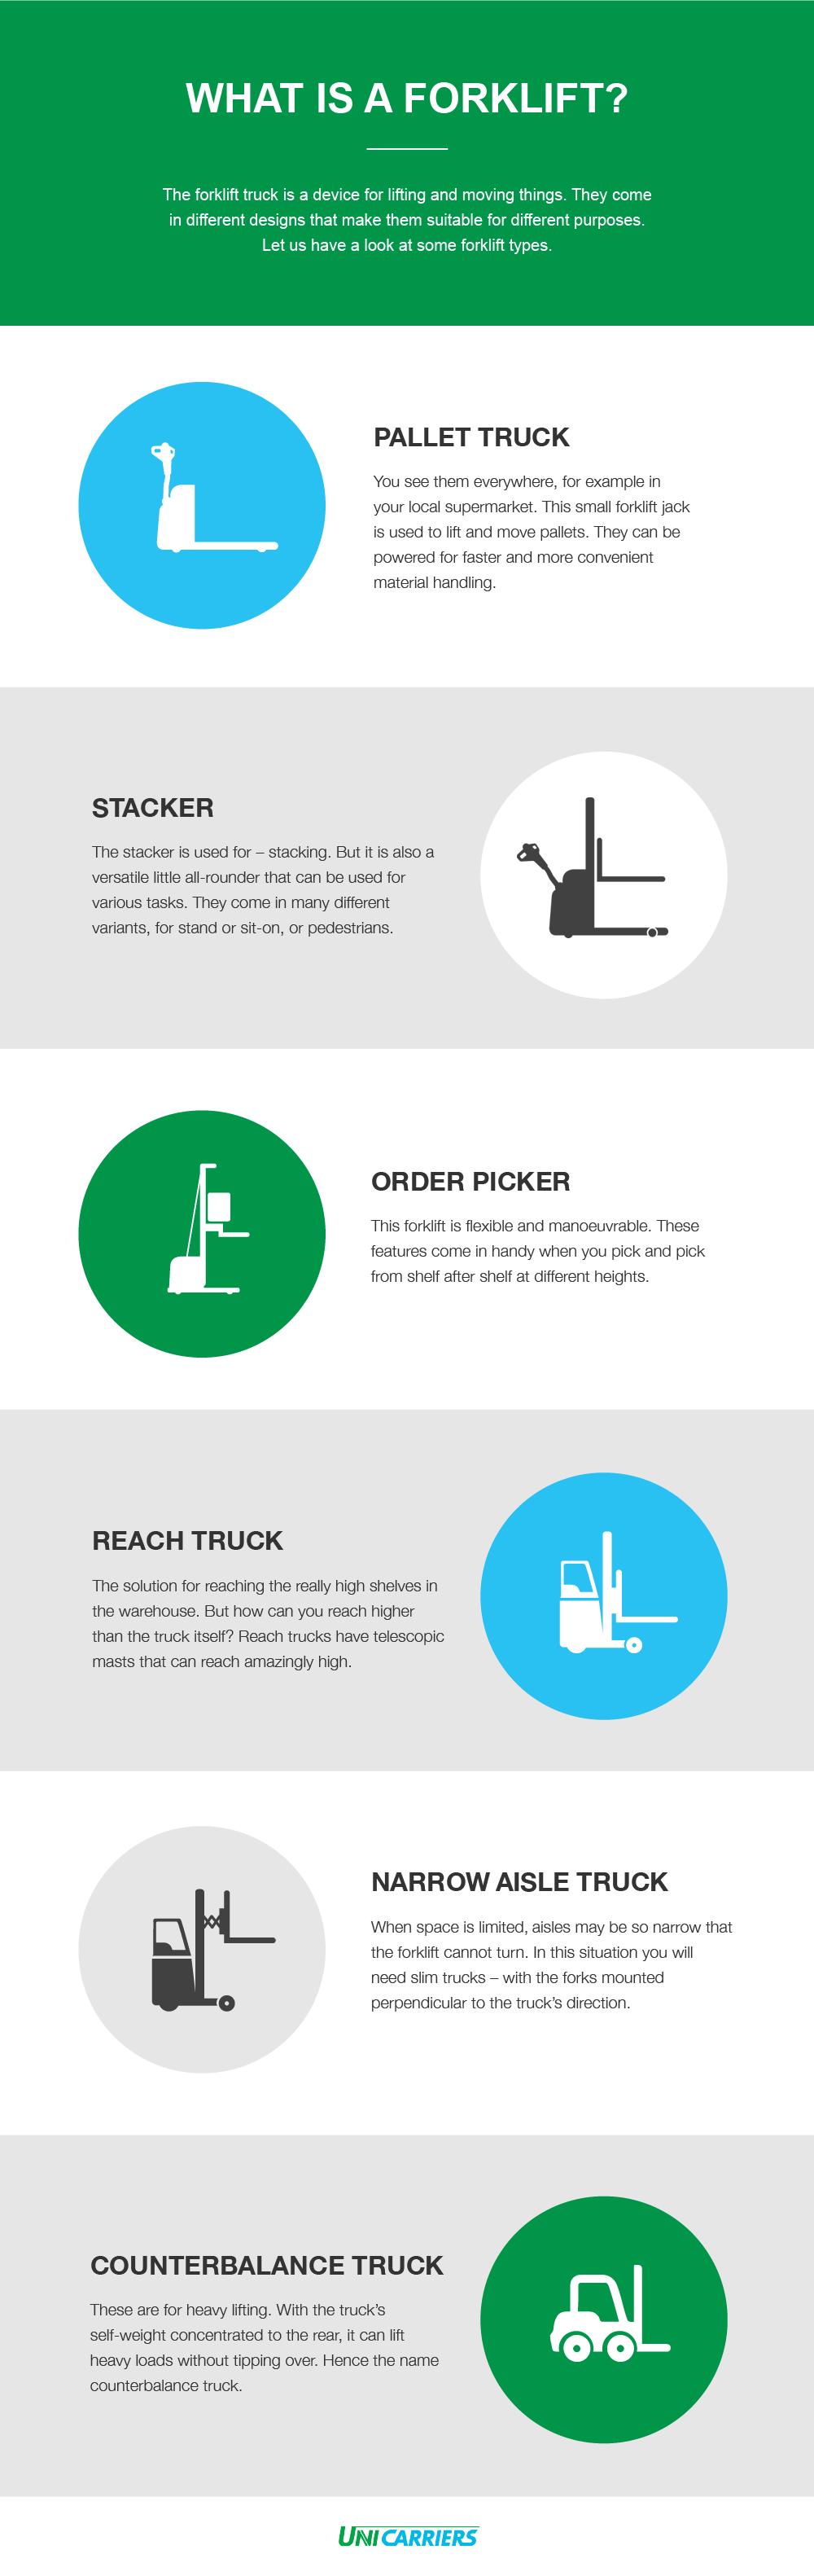 Forklifts Material Handling Equipment Warehousing Upcomingcarshq Com